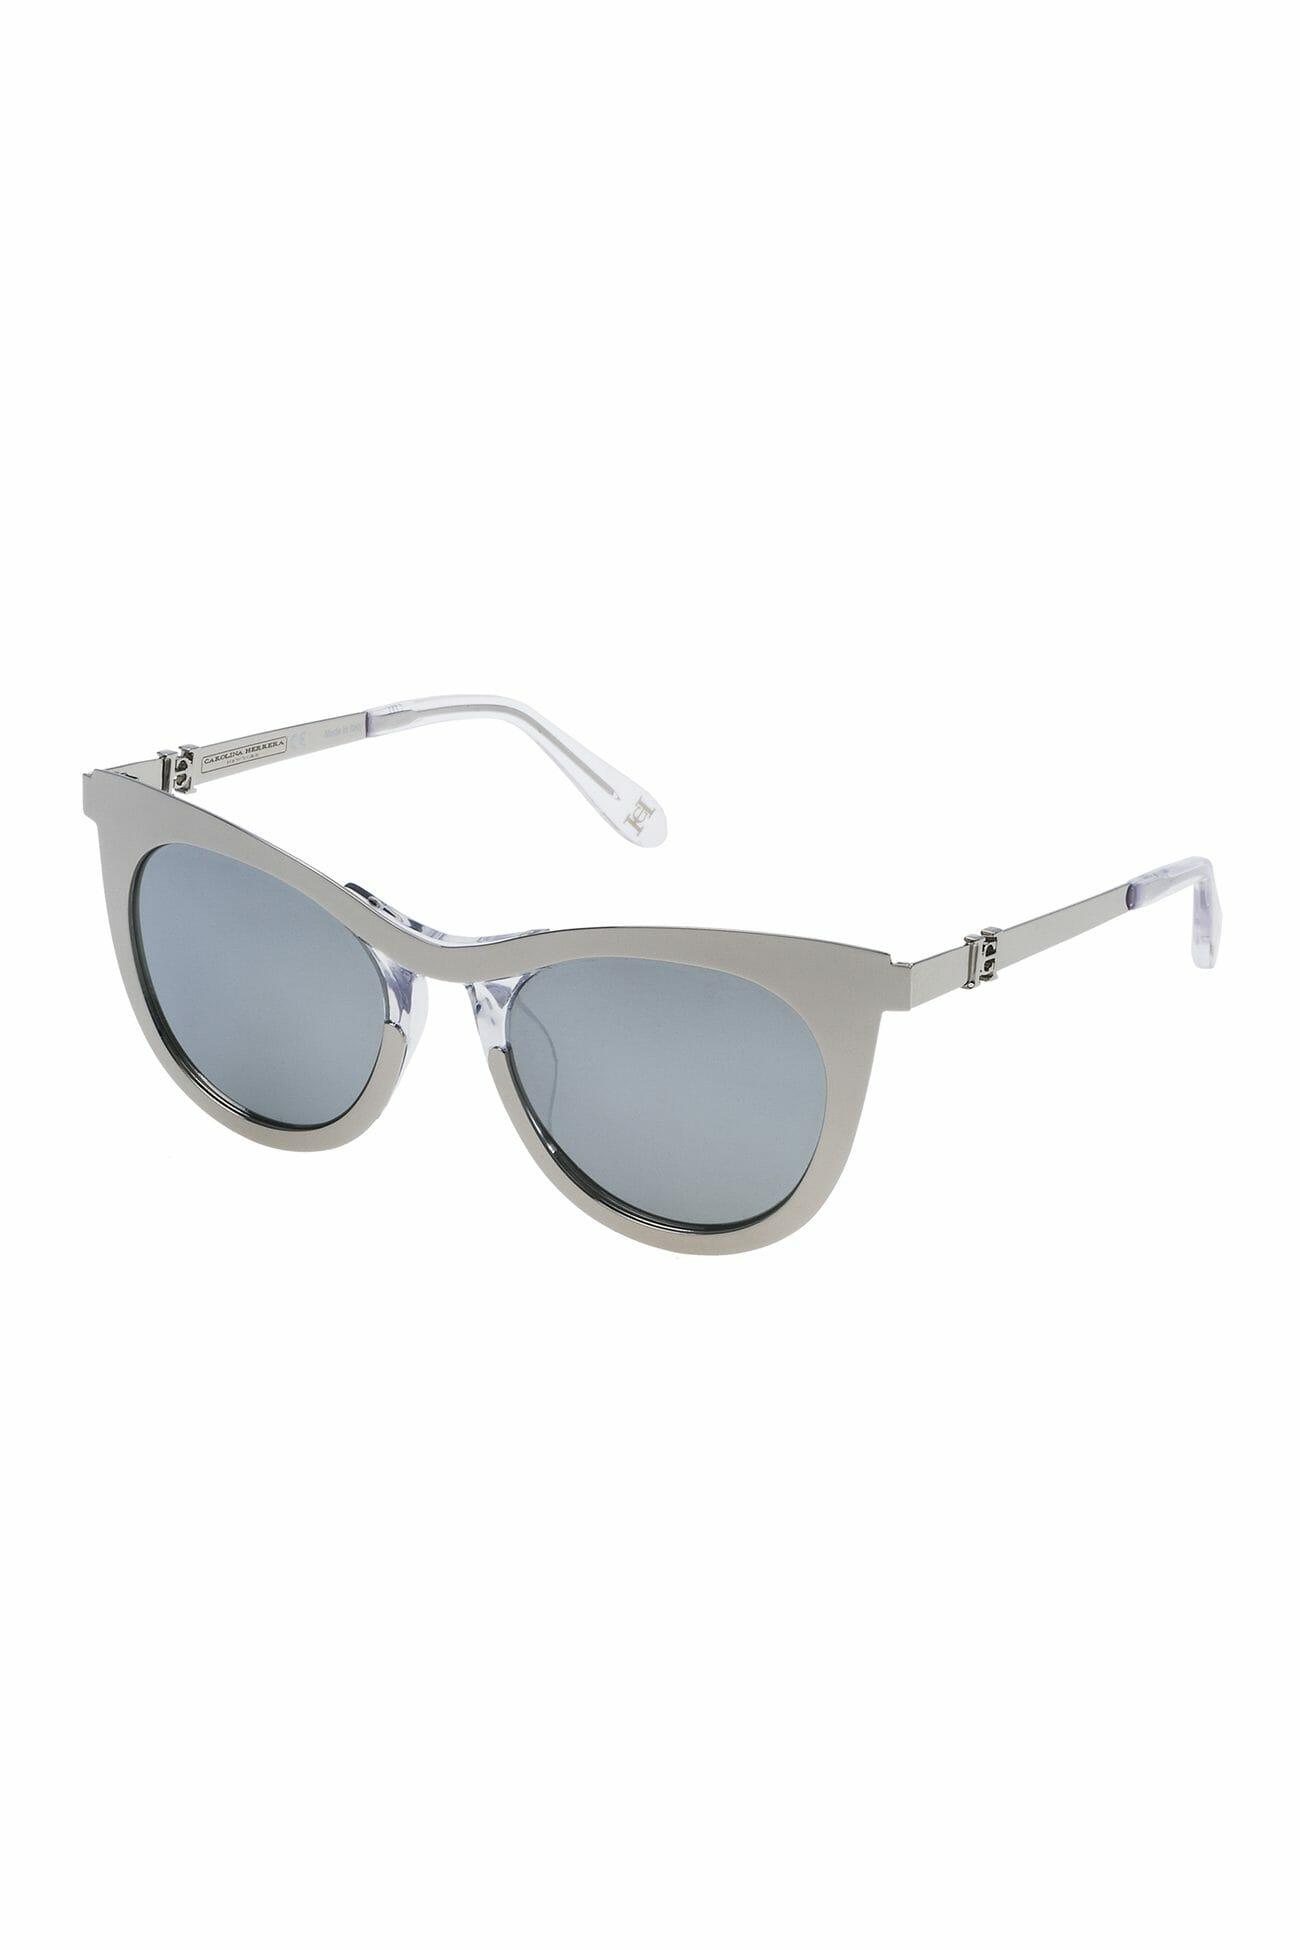 Carolina-Herrera-New-York-Eyewear-Reference579X-01